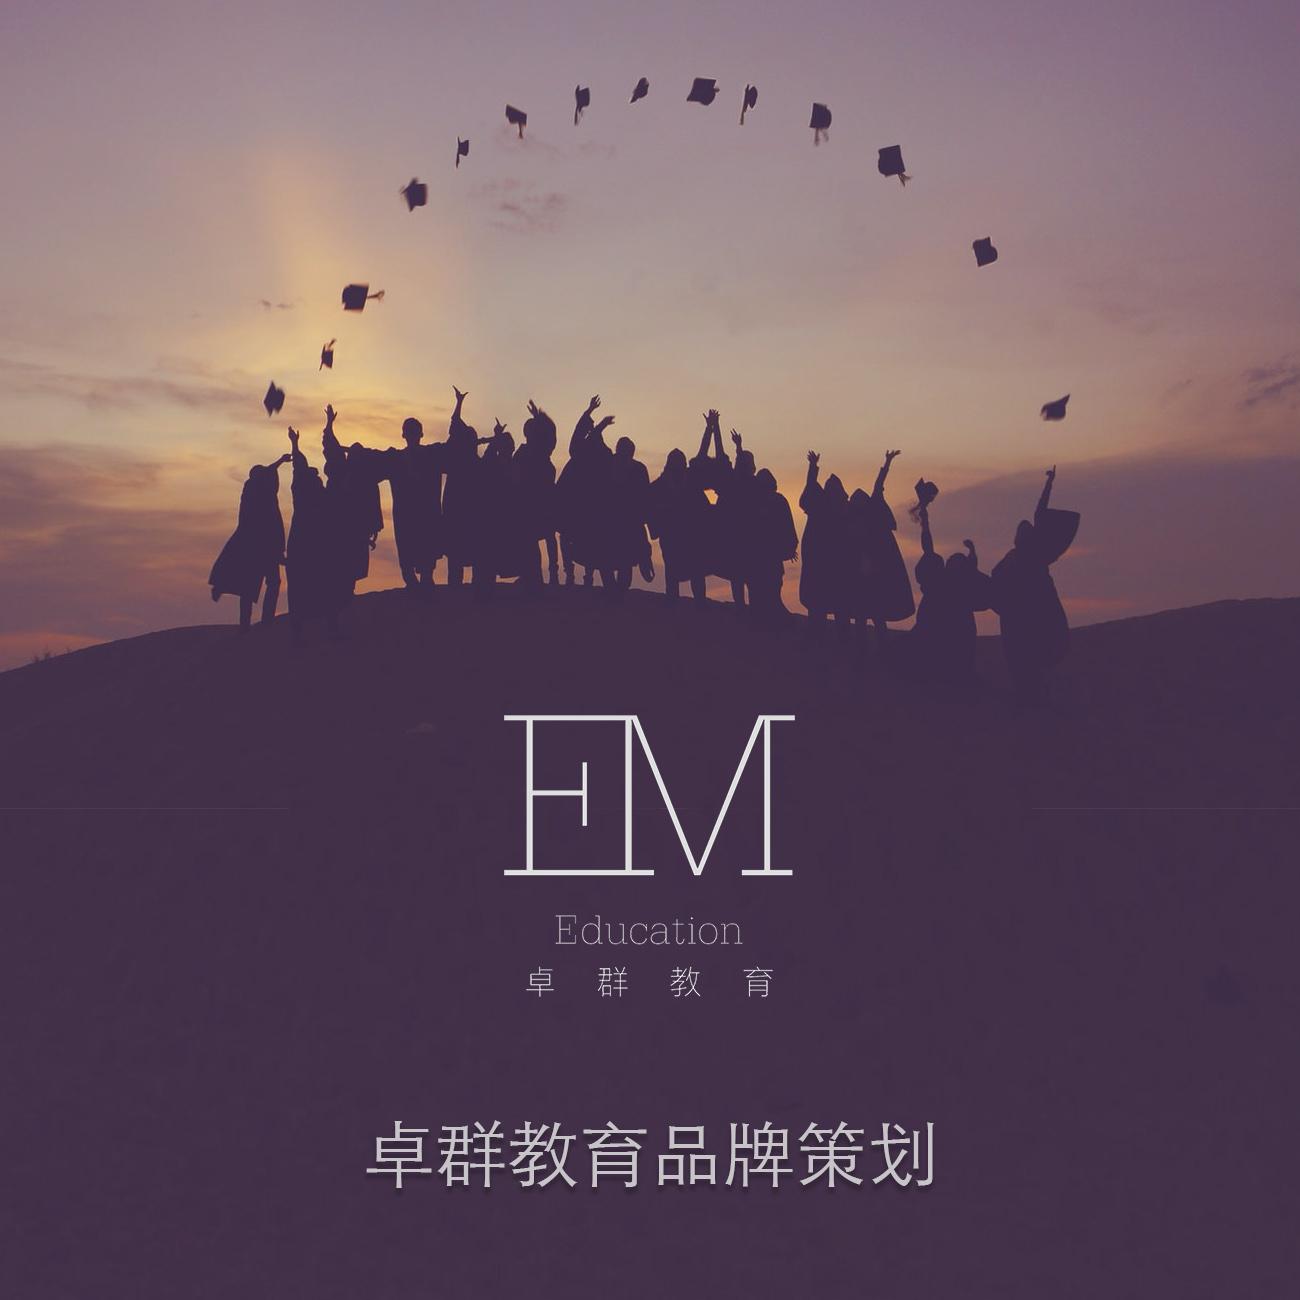 EM卓群教育品牌策划